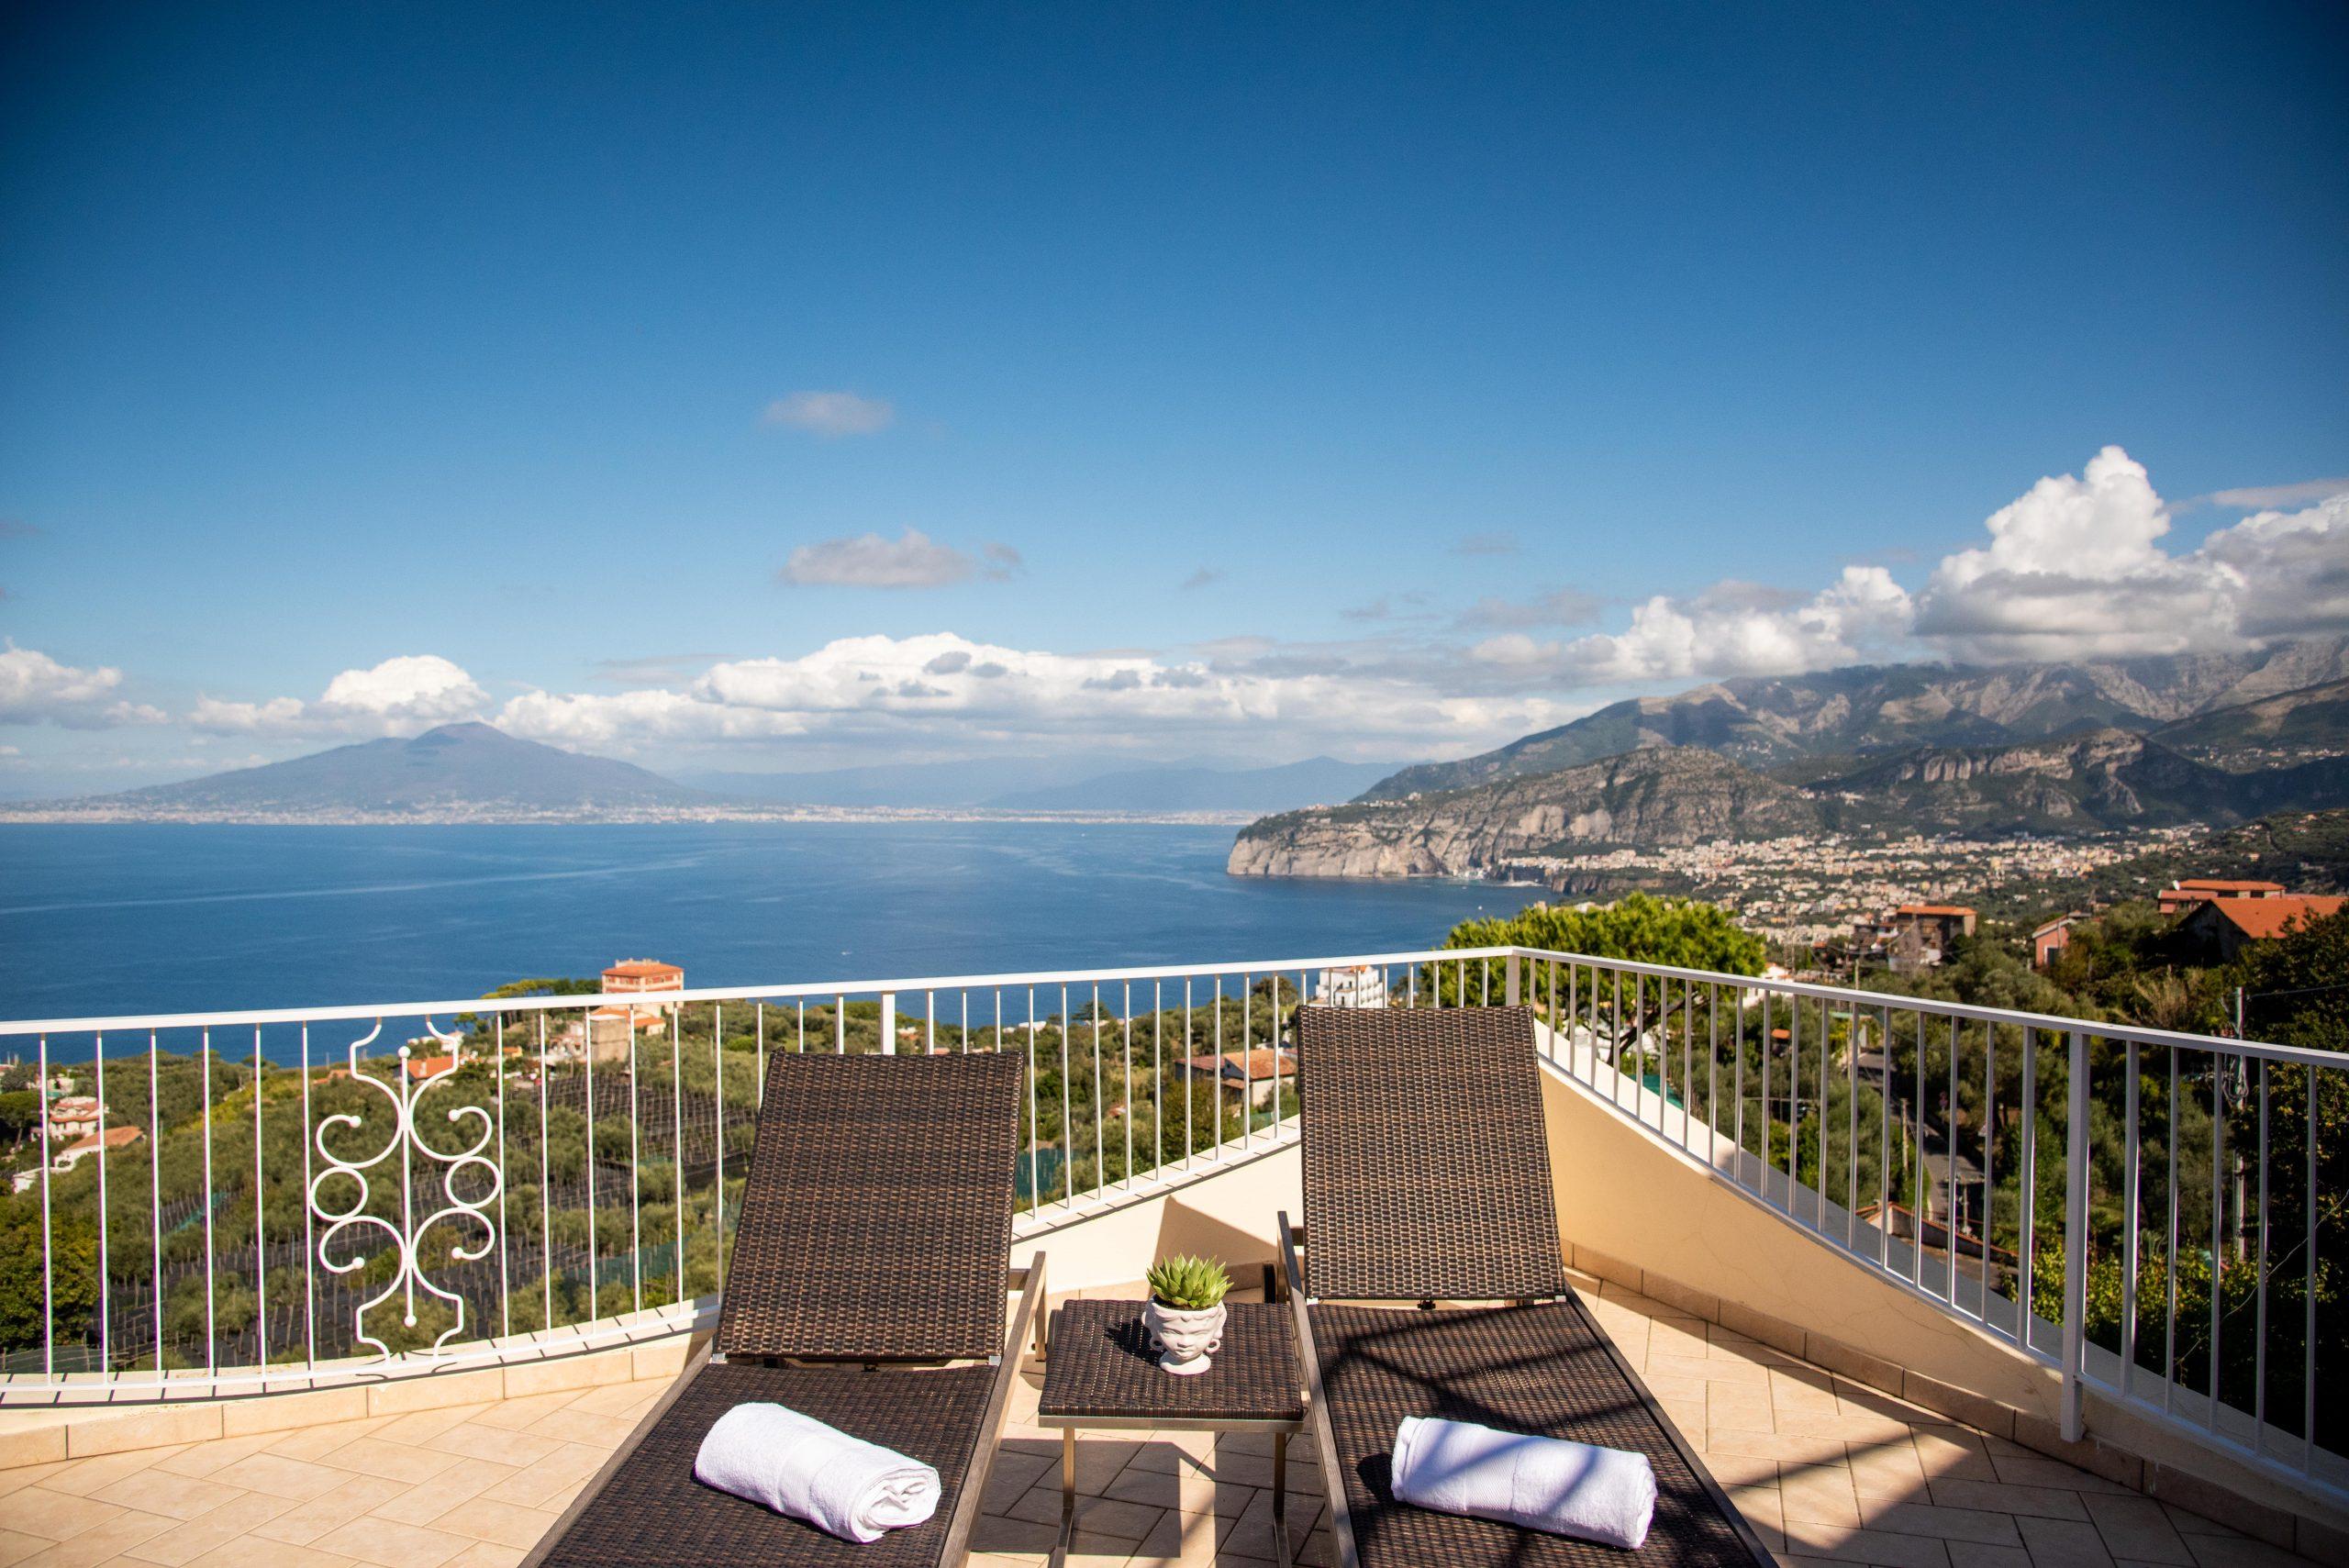 Villa Acampora Sorrento Sea View Terrace